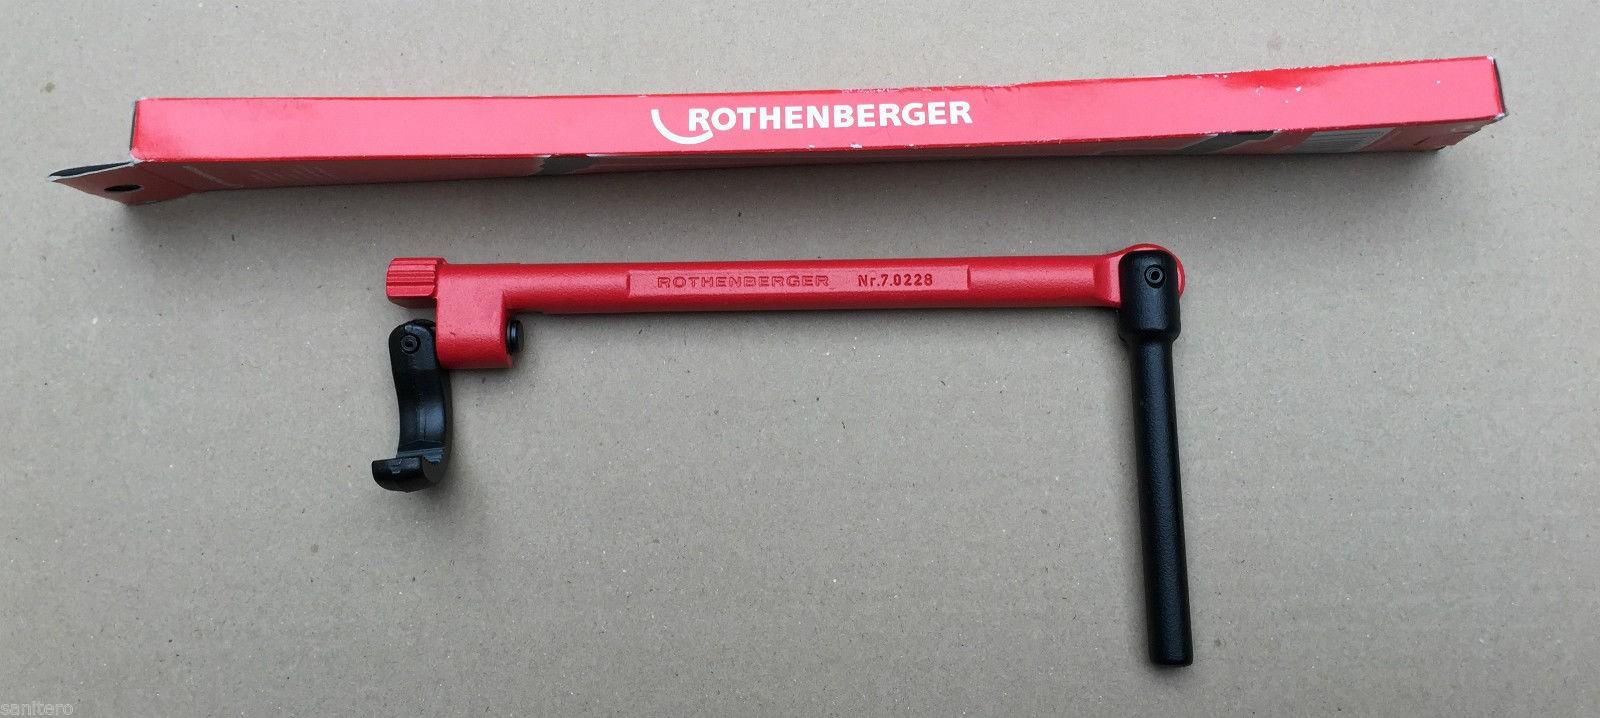 chiave-per-rubinetti-rothenberger